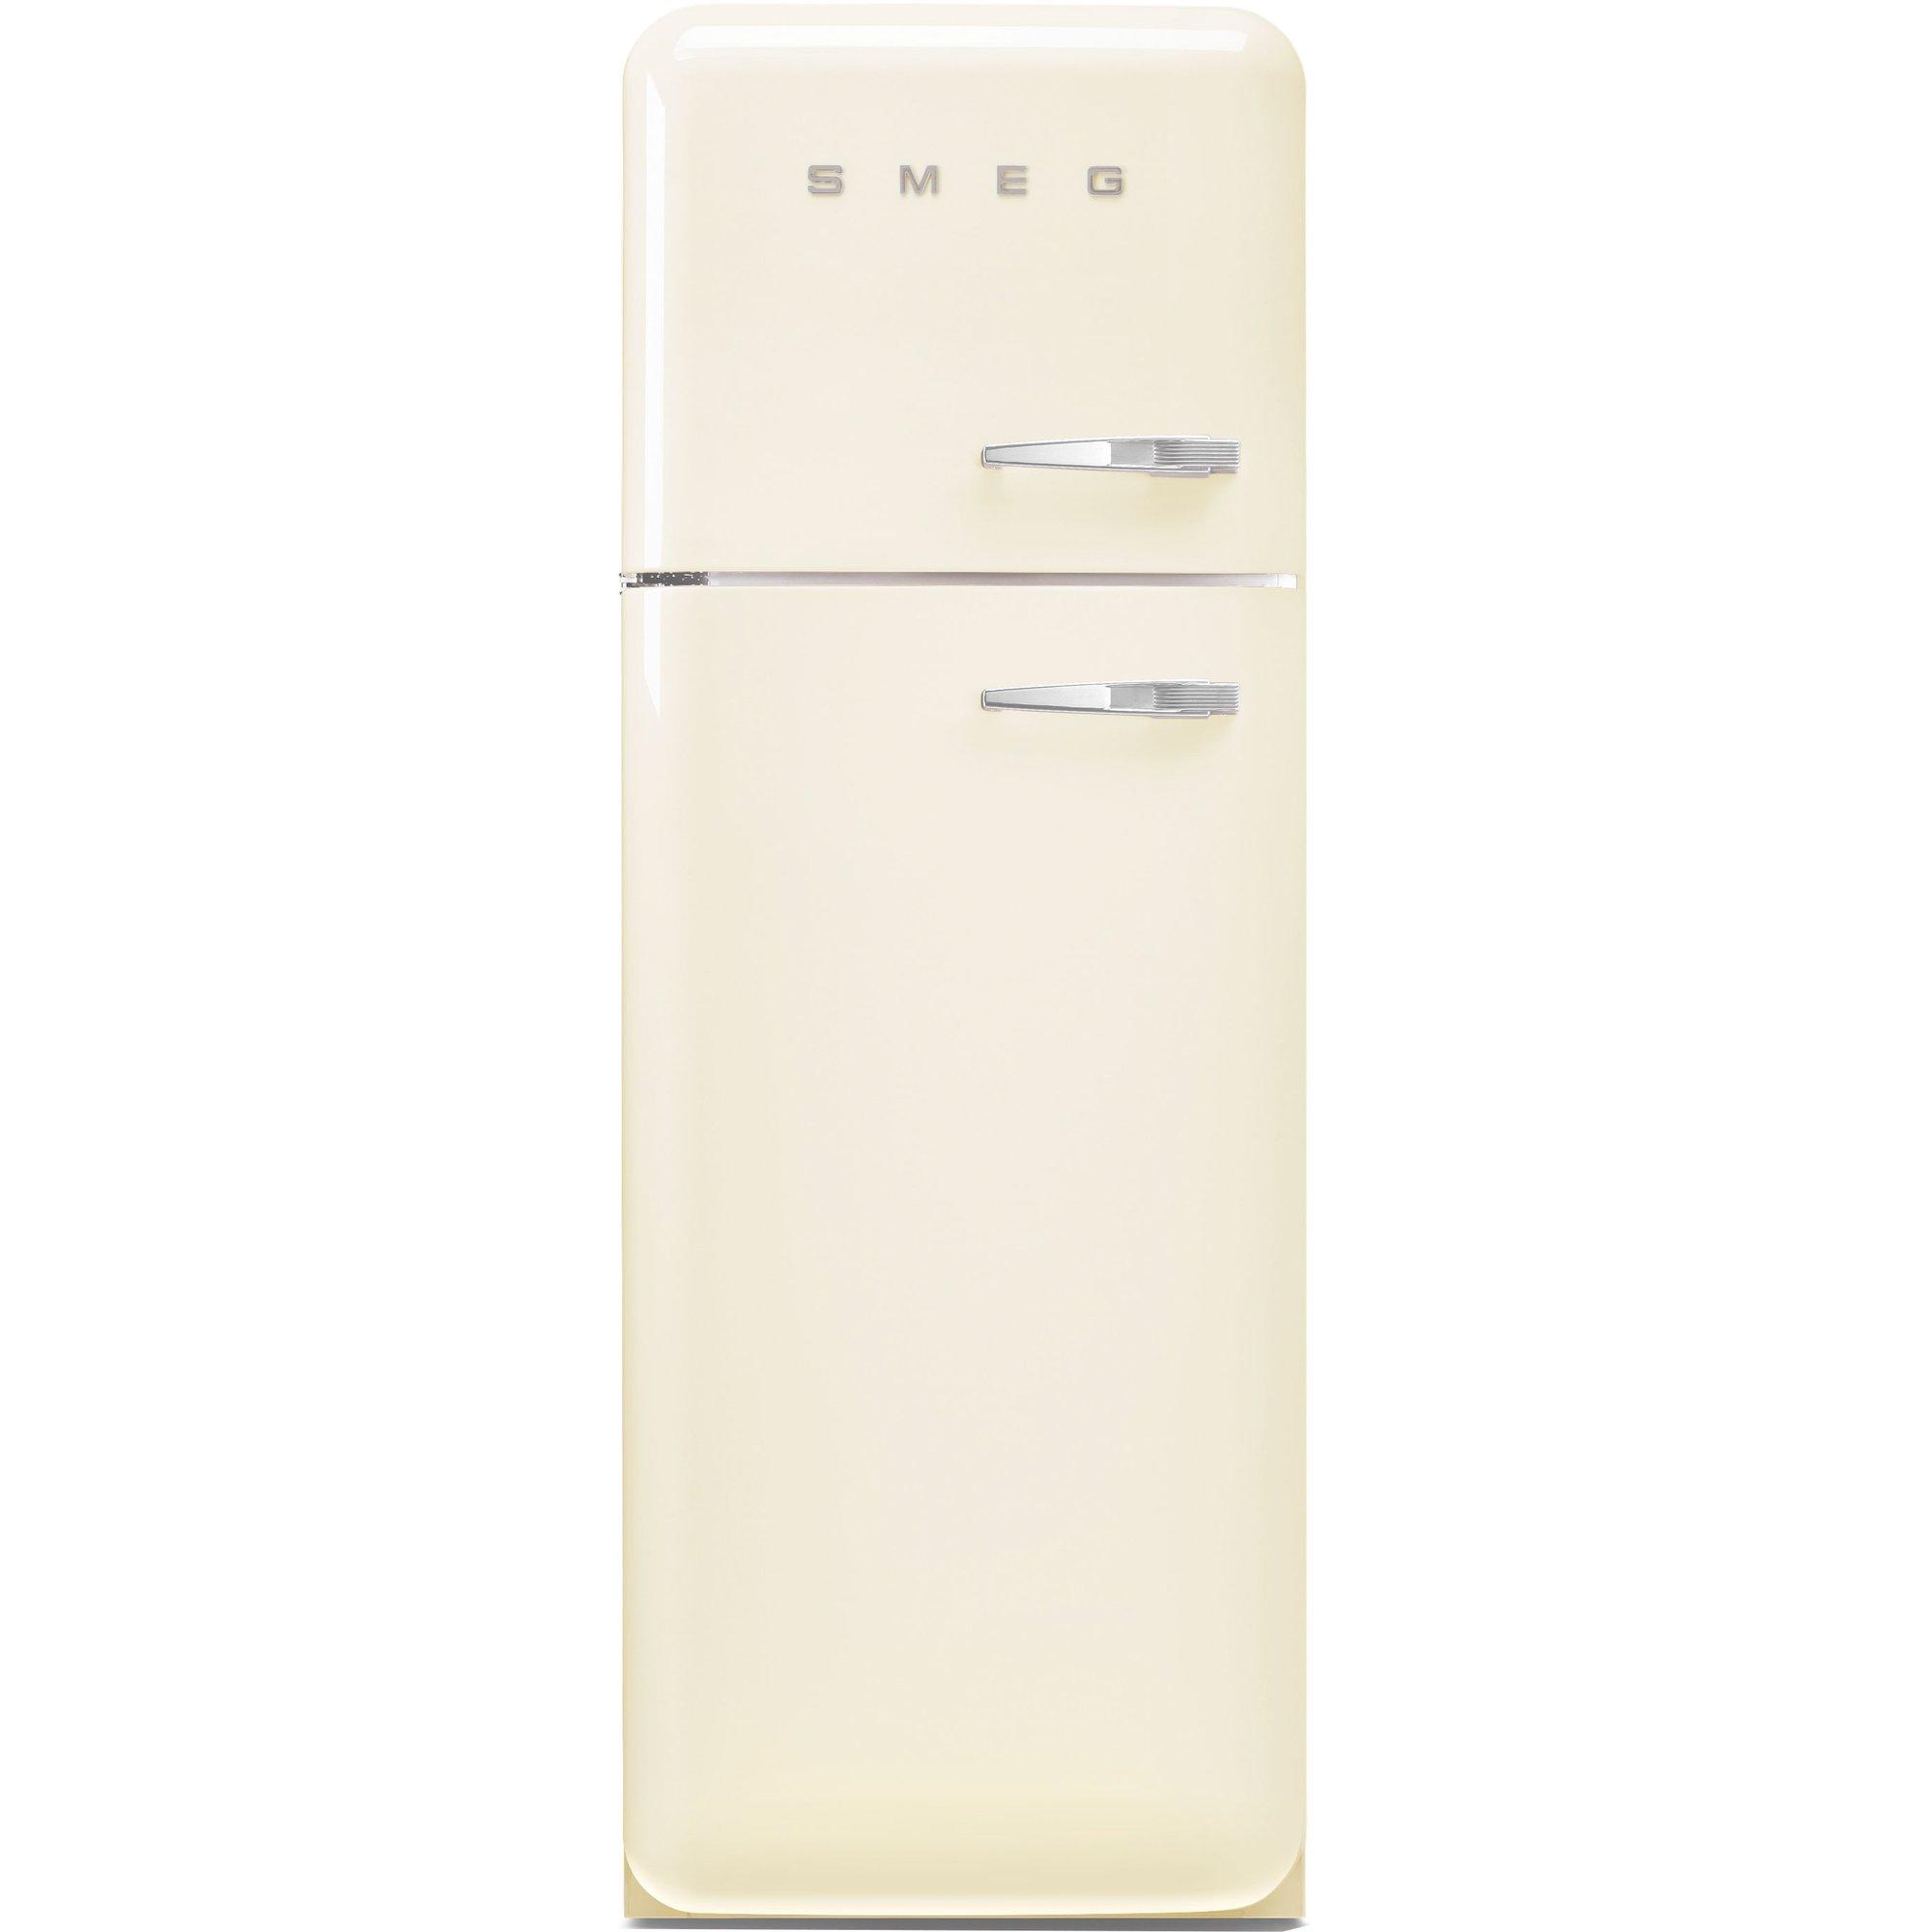 Smeg FAB30LCR5 Køle-/fryseskab creme